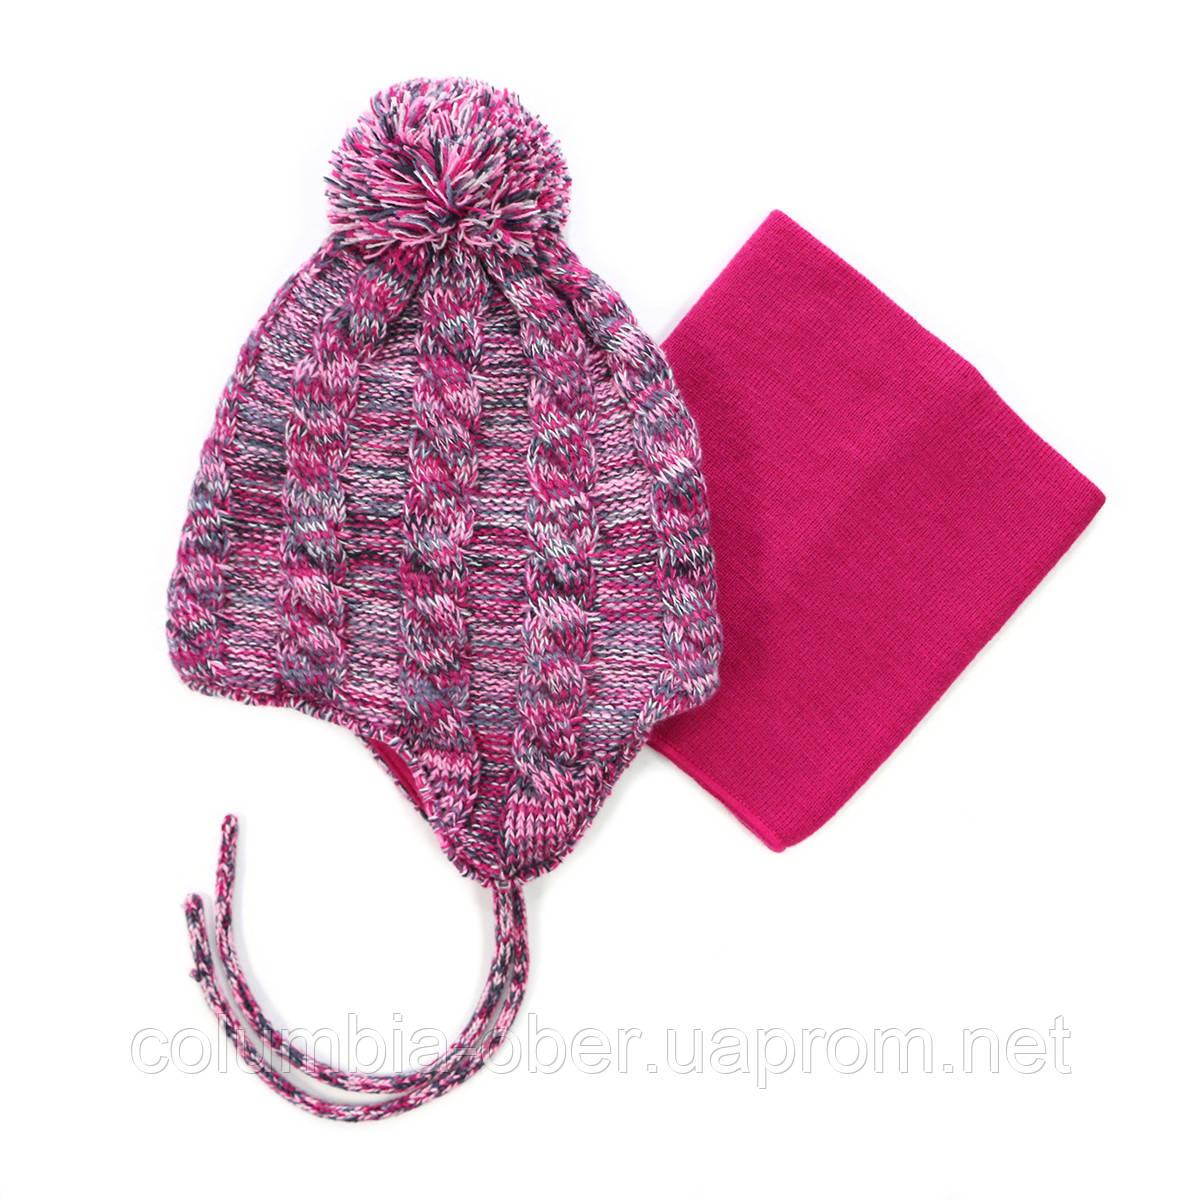 Зимняя шапка+манишка для девочки PELUCHE 50 EF ACC F16 Lollipop. Размер 3/5 и 6/8.